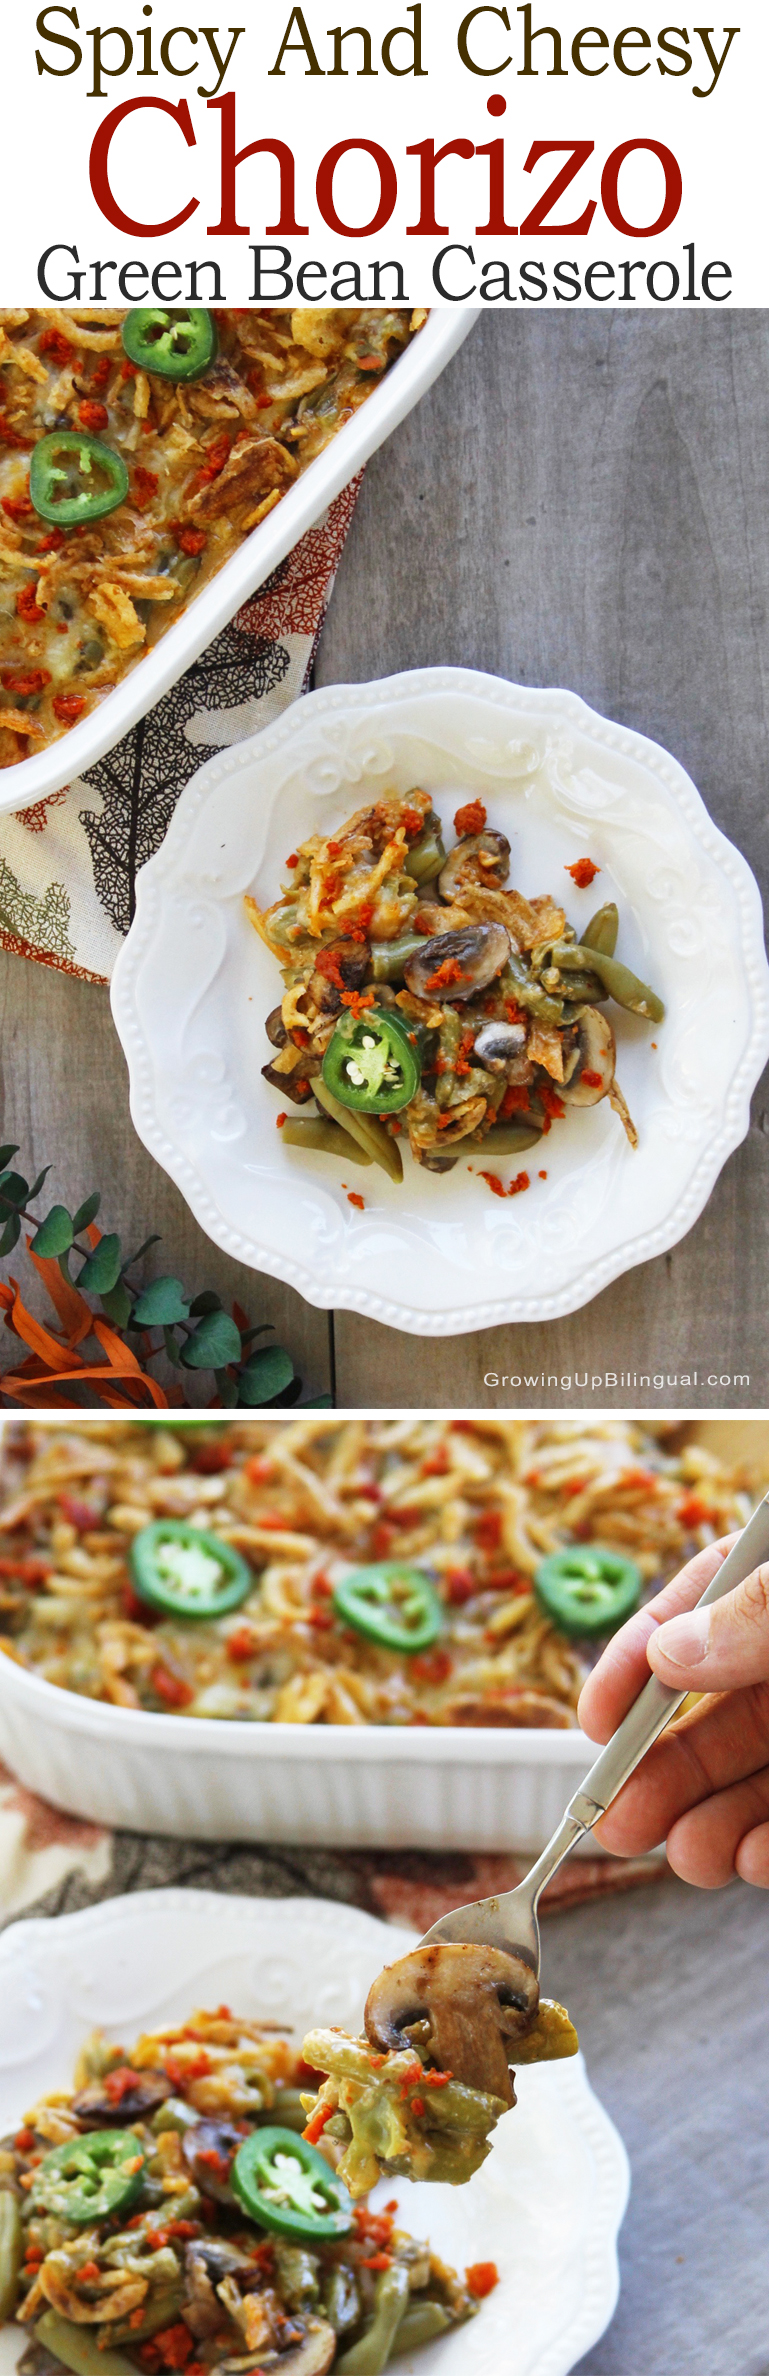 Spicy And Cheesy Chorizo Green Bean Casserole pinterest